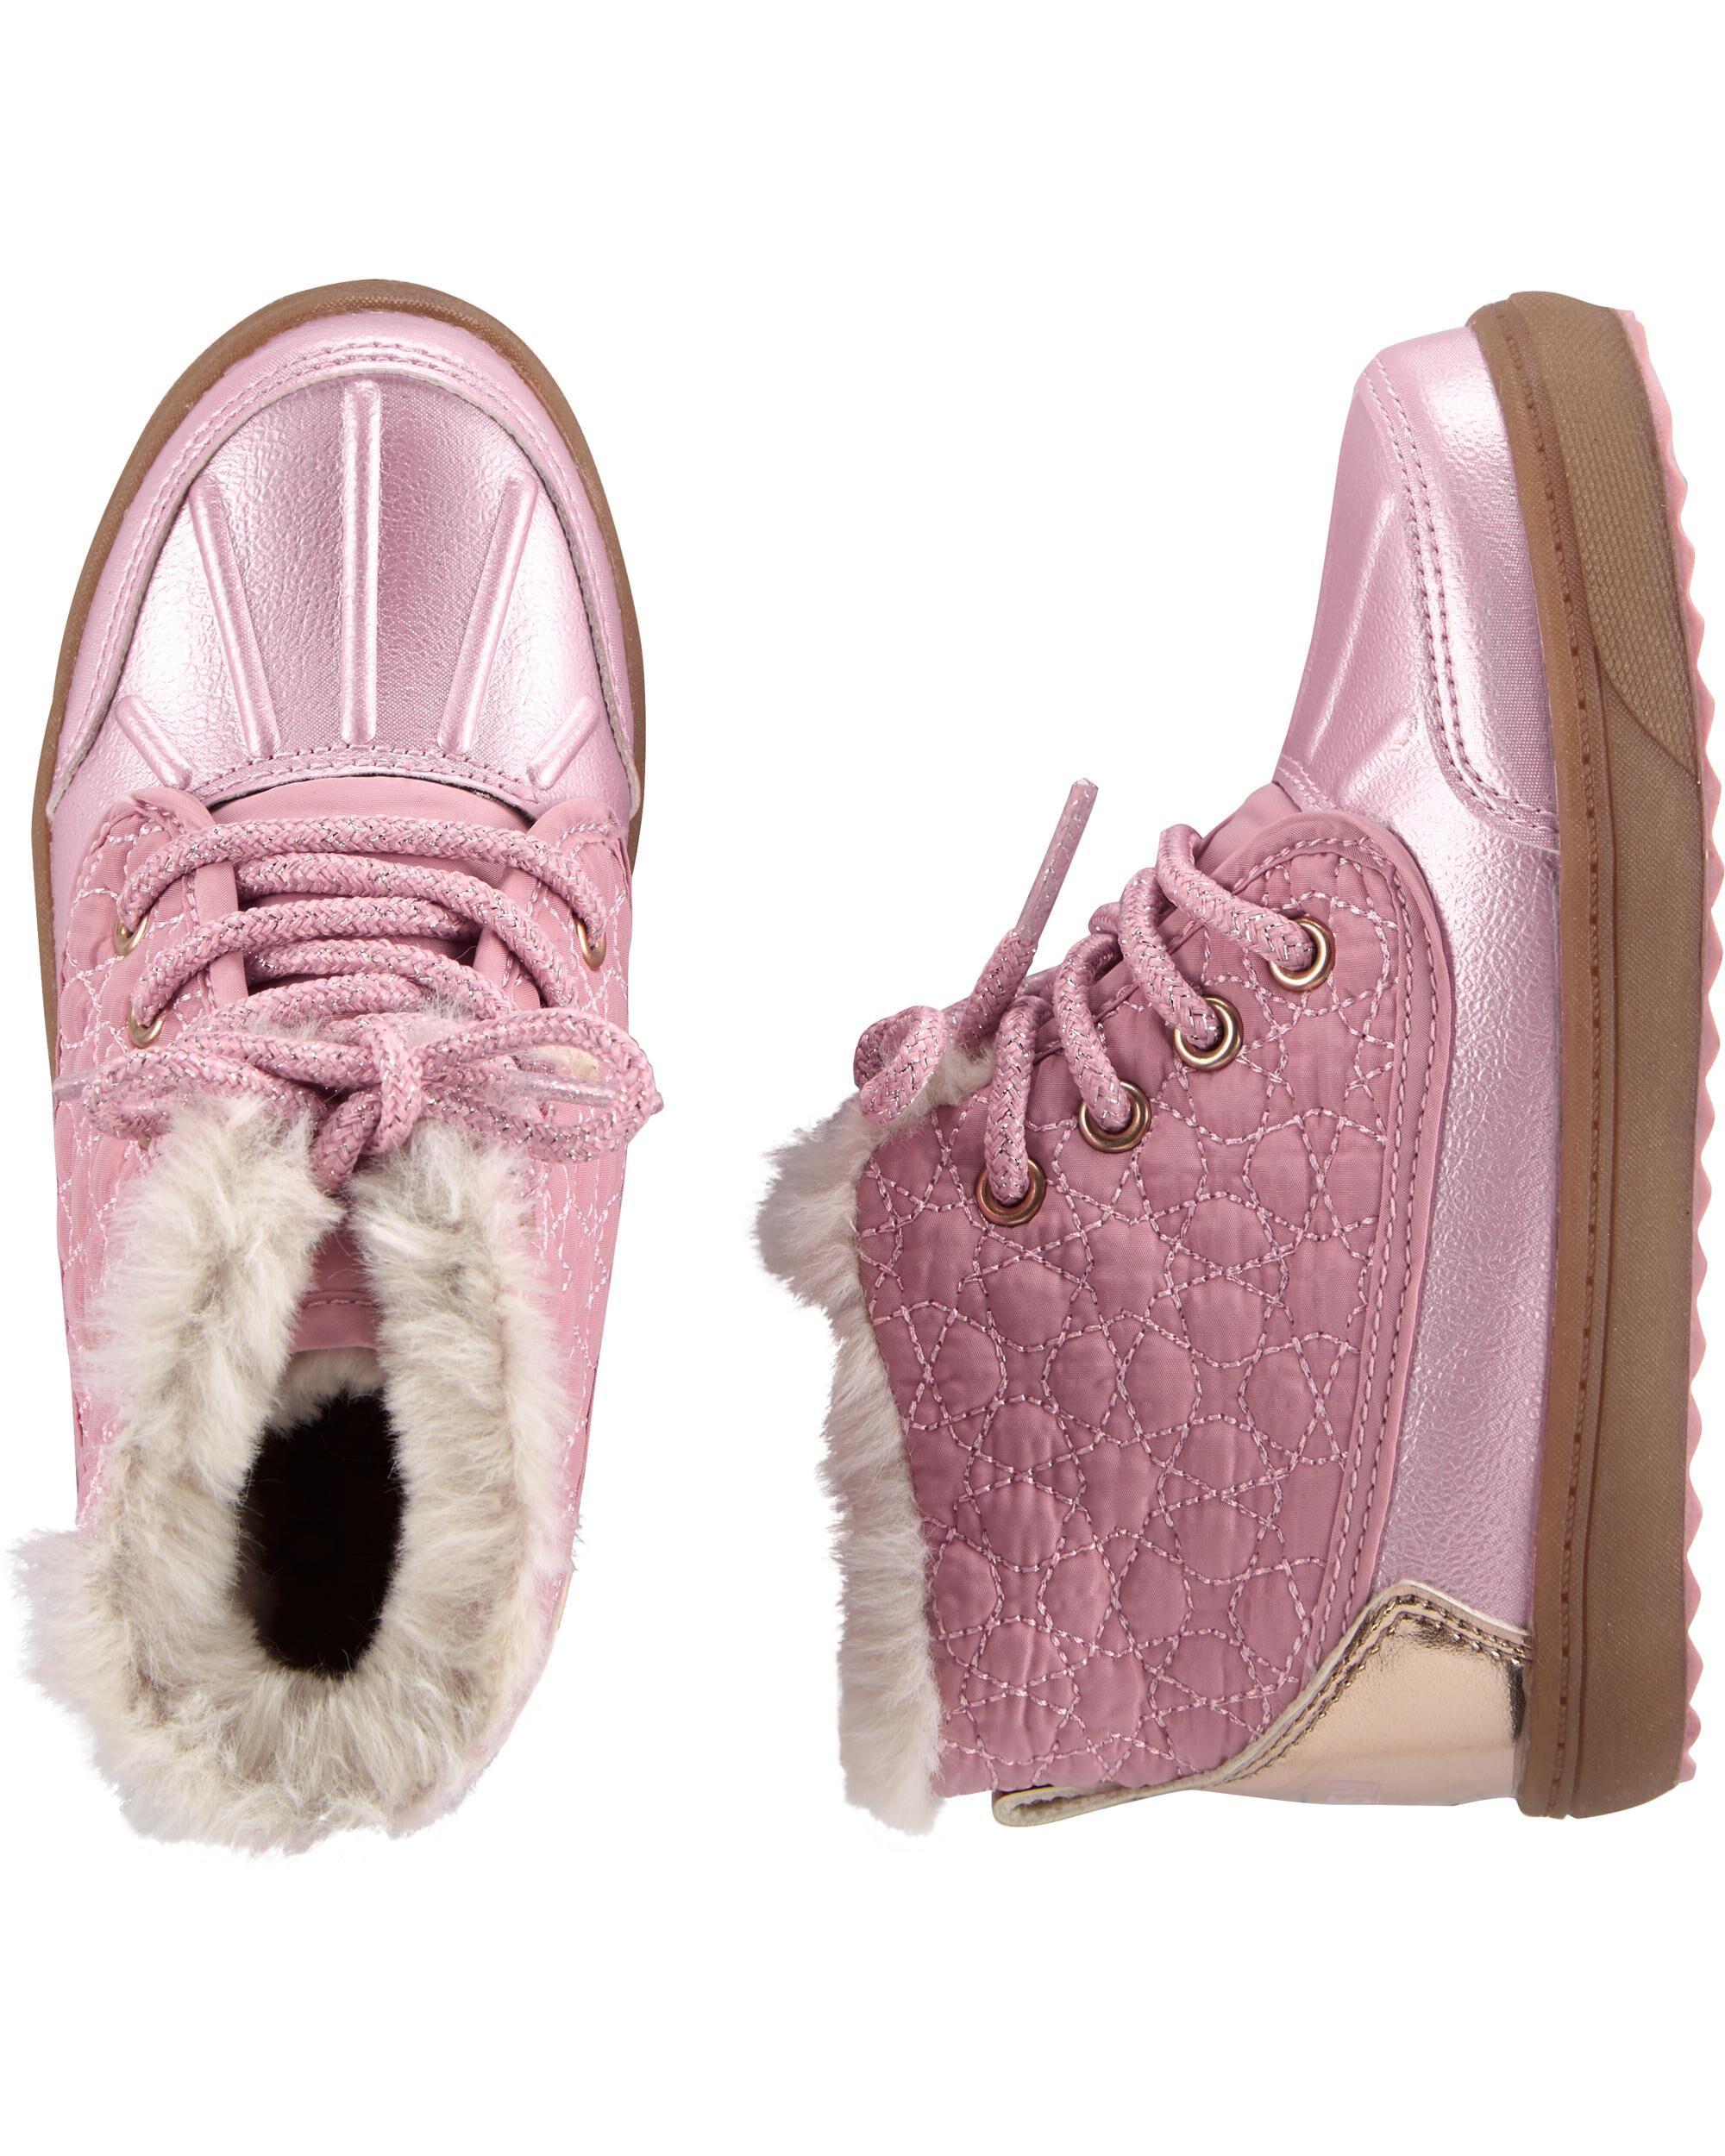 OshKosh Pink Duck Boots | carters.com